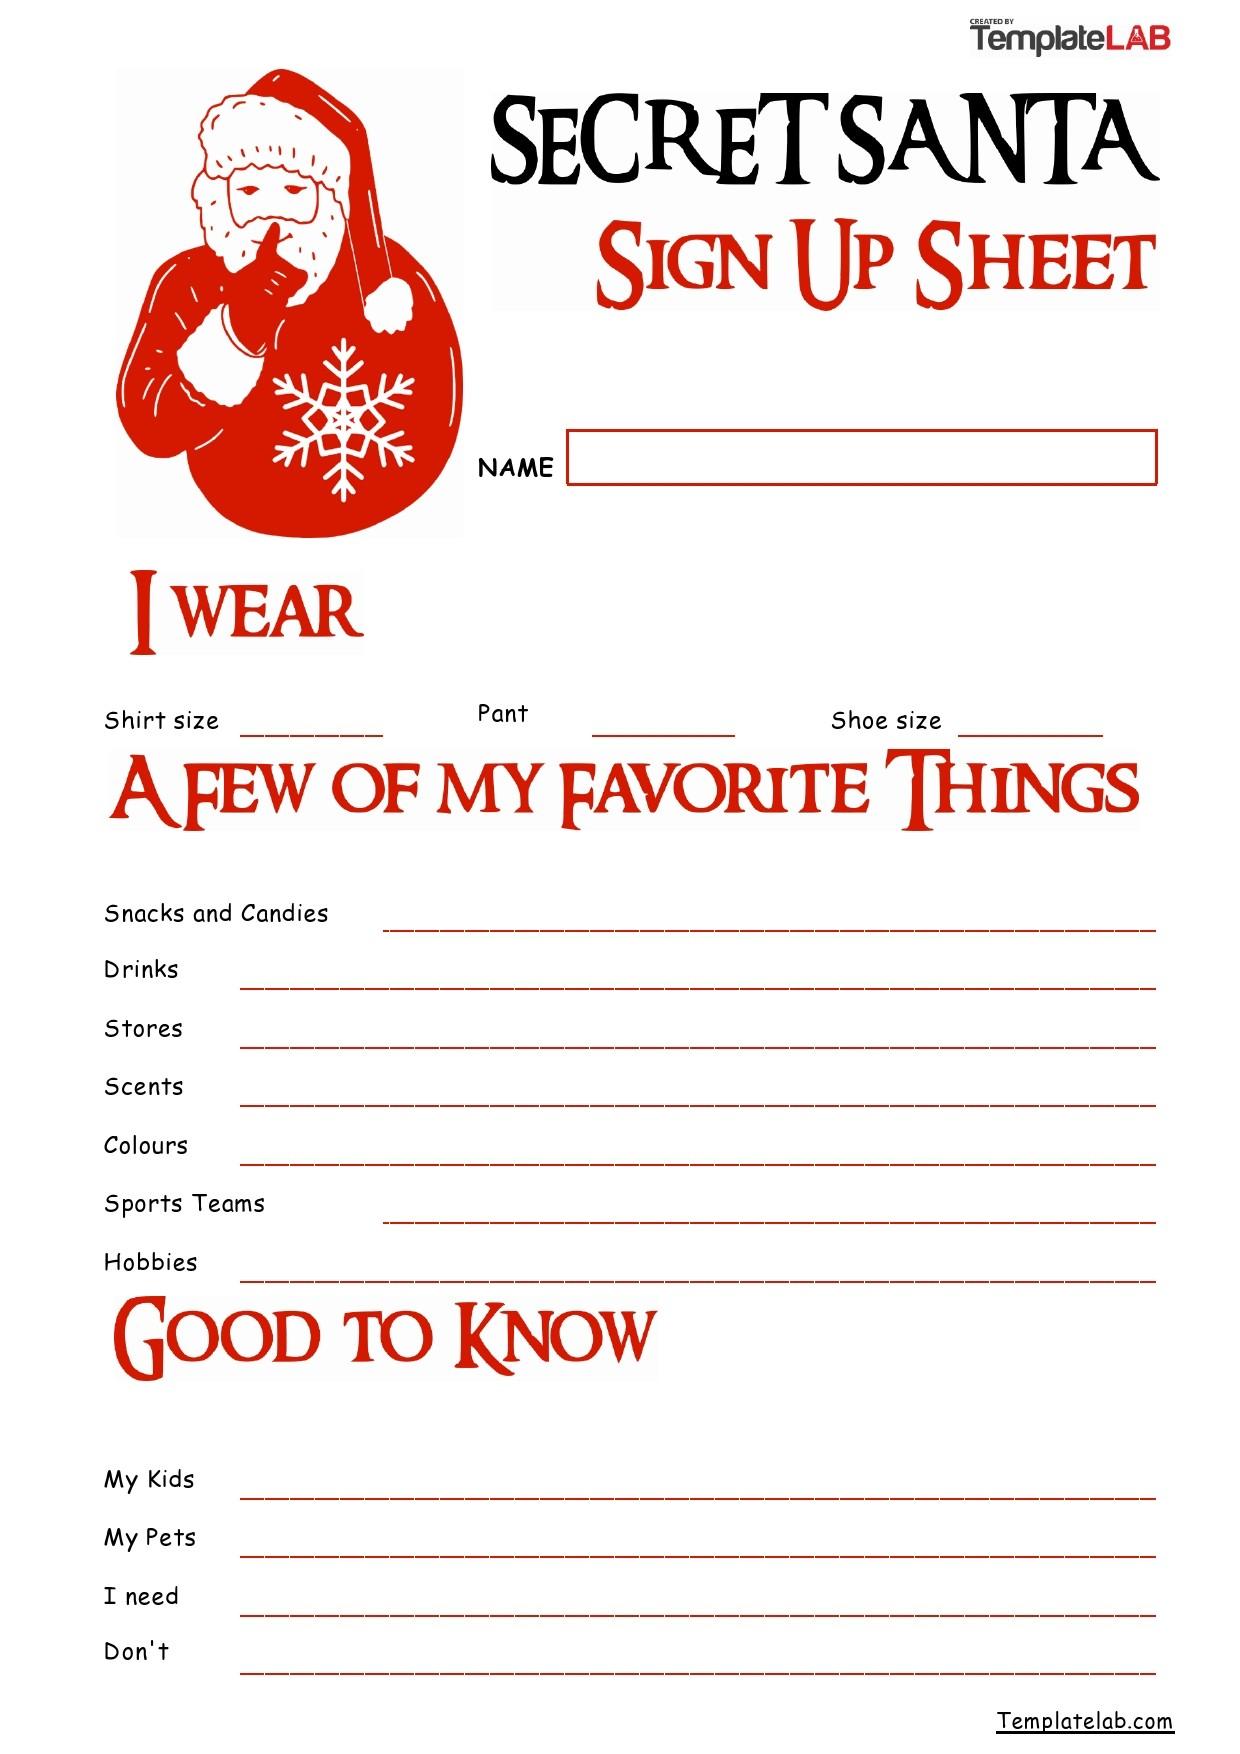 Free Secret Santa Sign Up Sheet